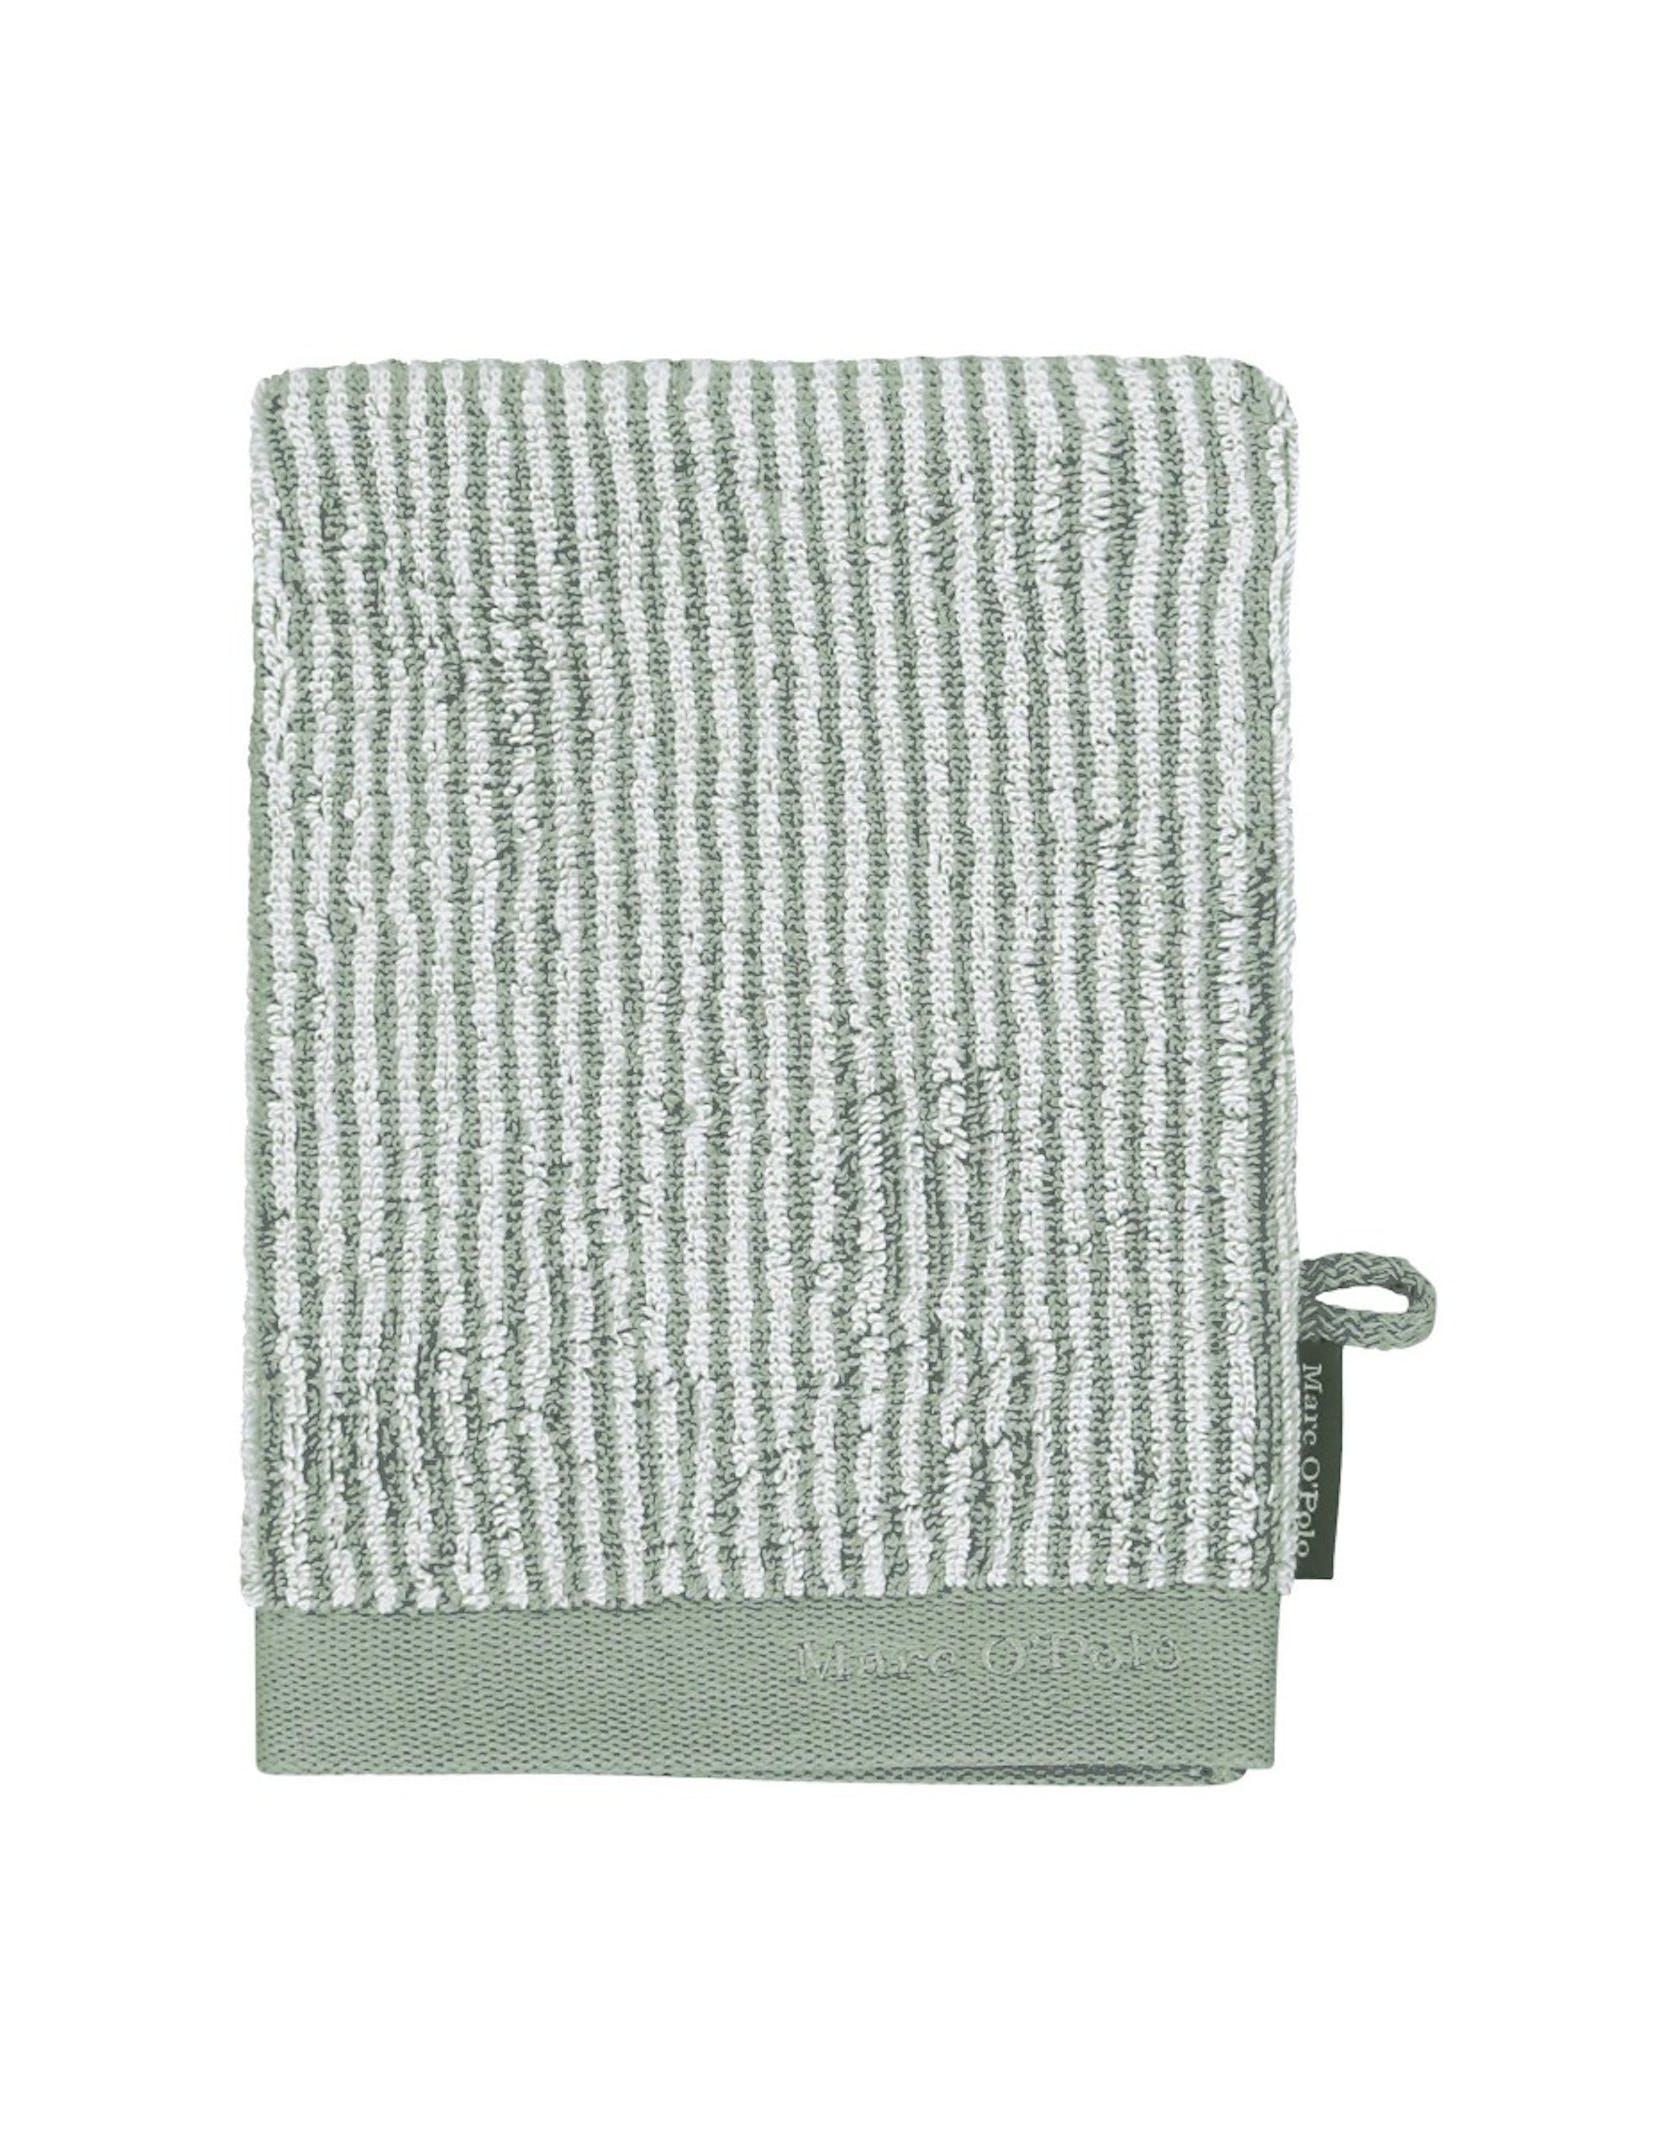 Marc O'Polo Timeless Tone Stripe Waschhandschuhe Streifen Grün / Off White